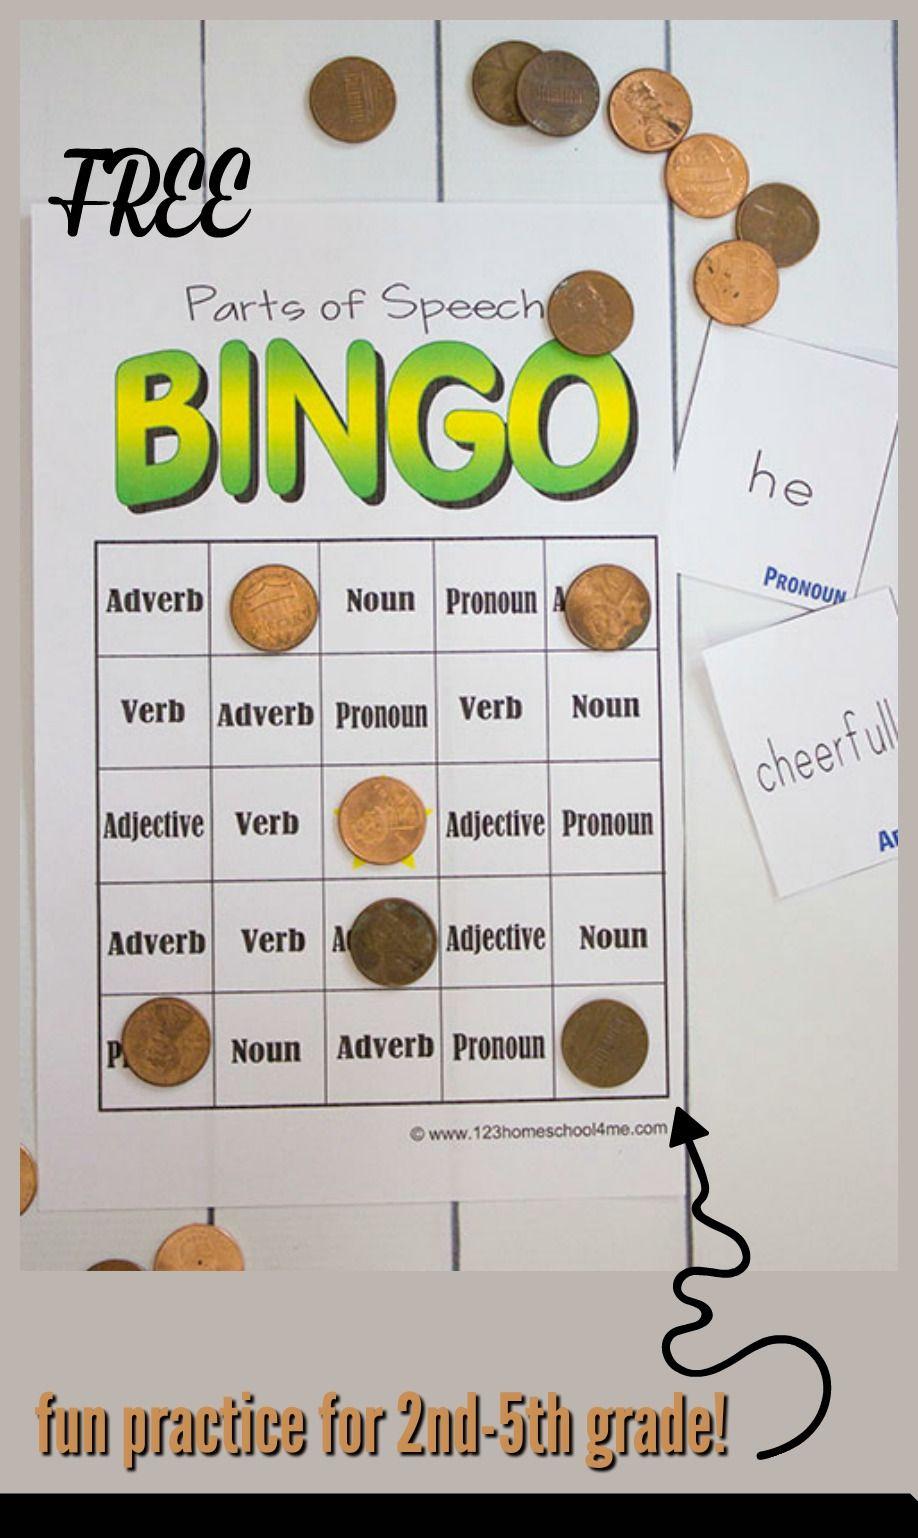 Free Parts Of Speech Game | Kindergarten | Parts Of Speech, Parts Of - Free Printable Parts Of Speech Bingo